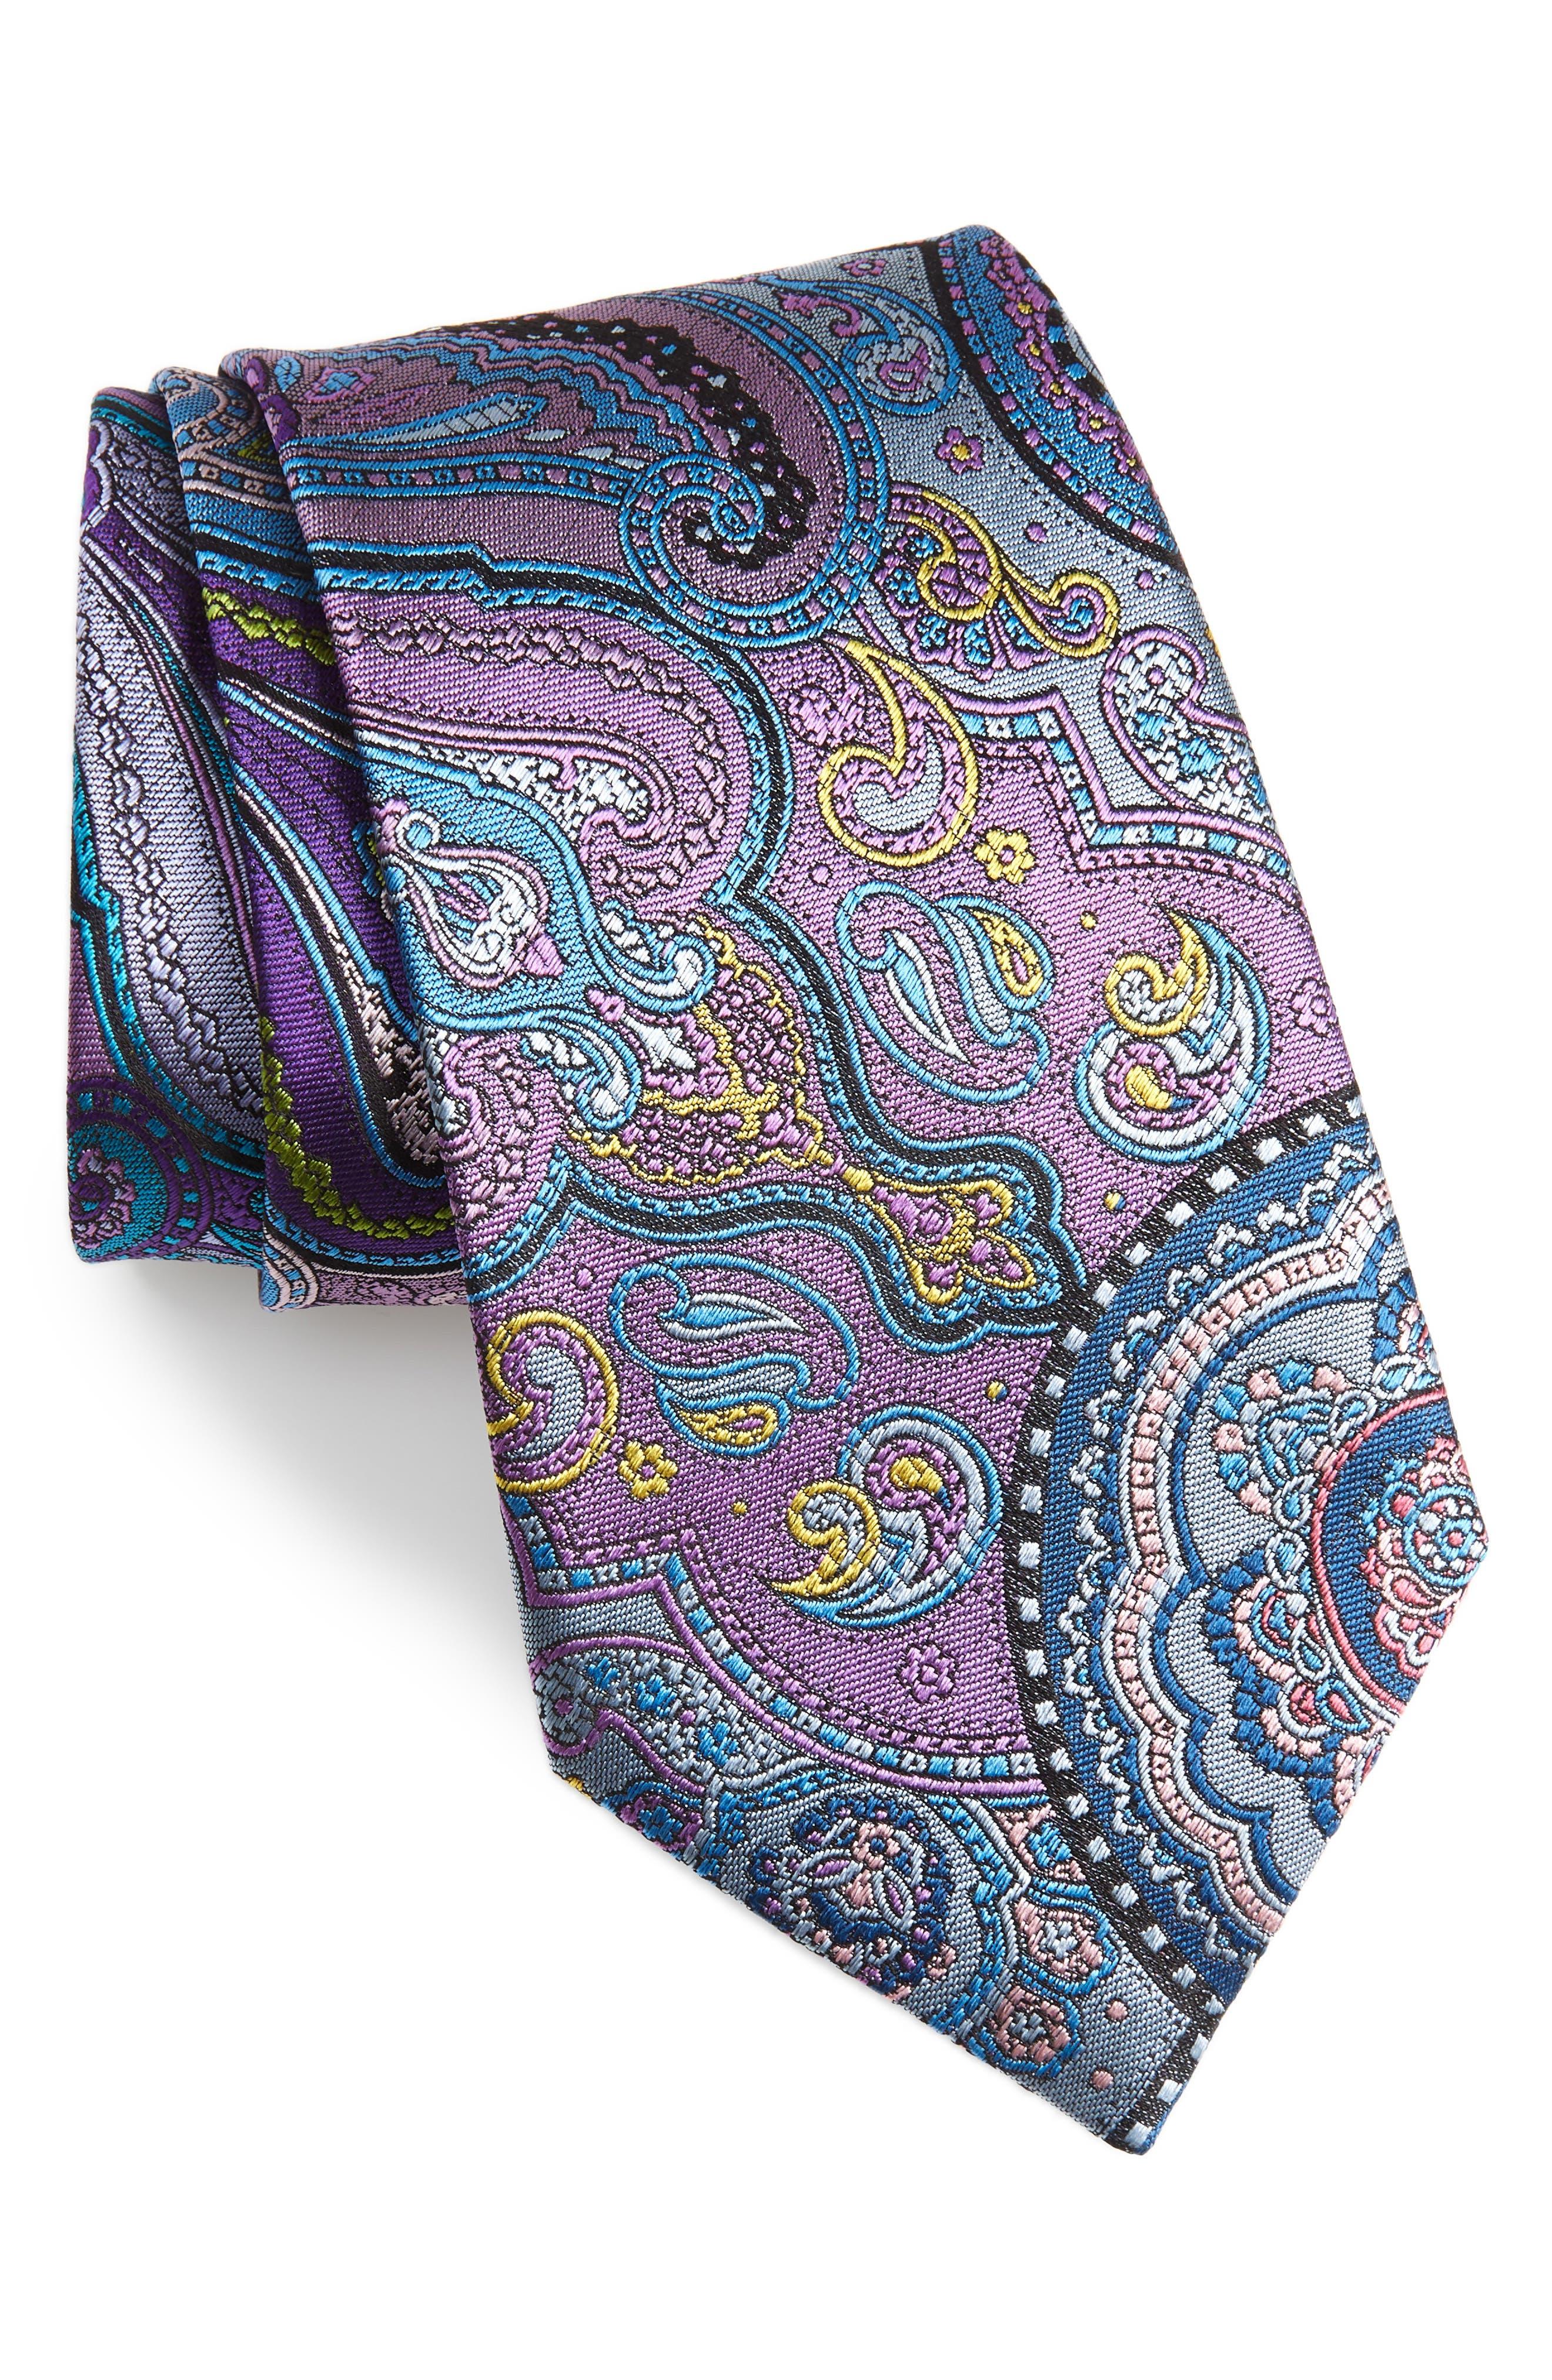 ERMENEGILDO ZEGNA Quindici Paisley Silk Tie, Main, color, PURPLE